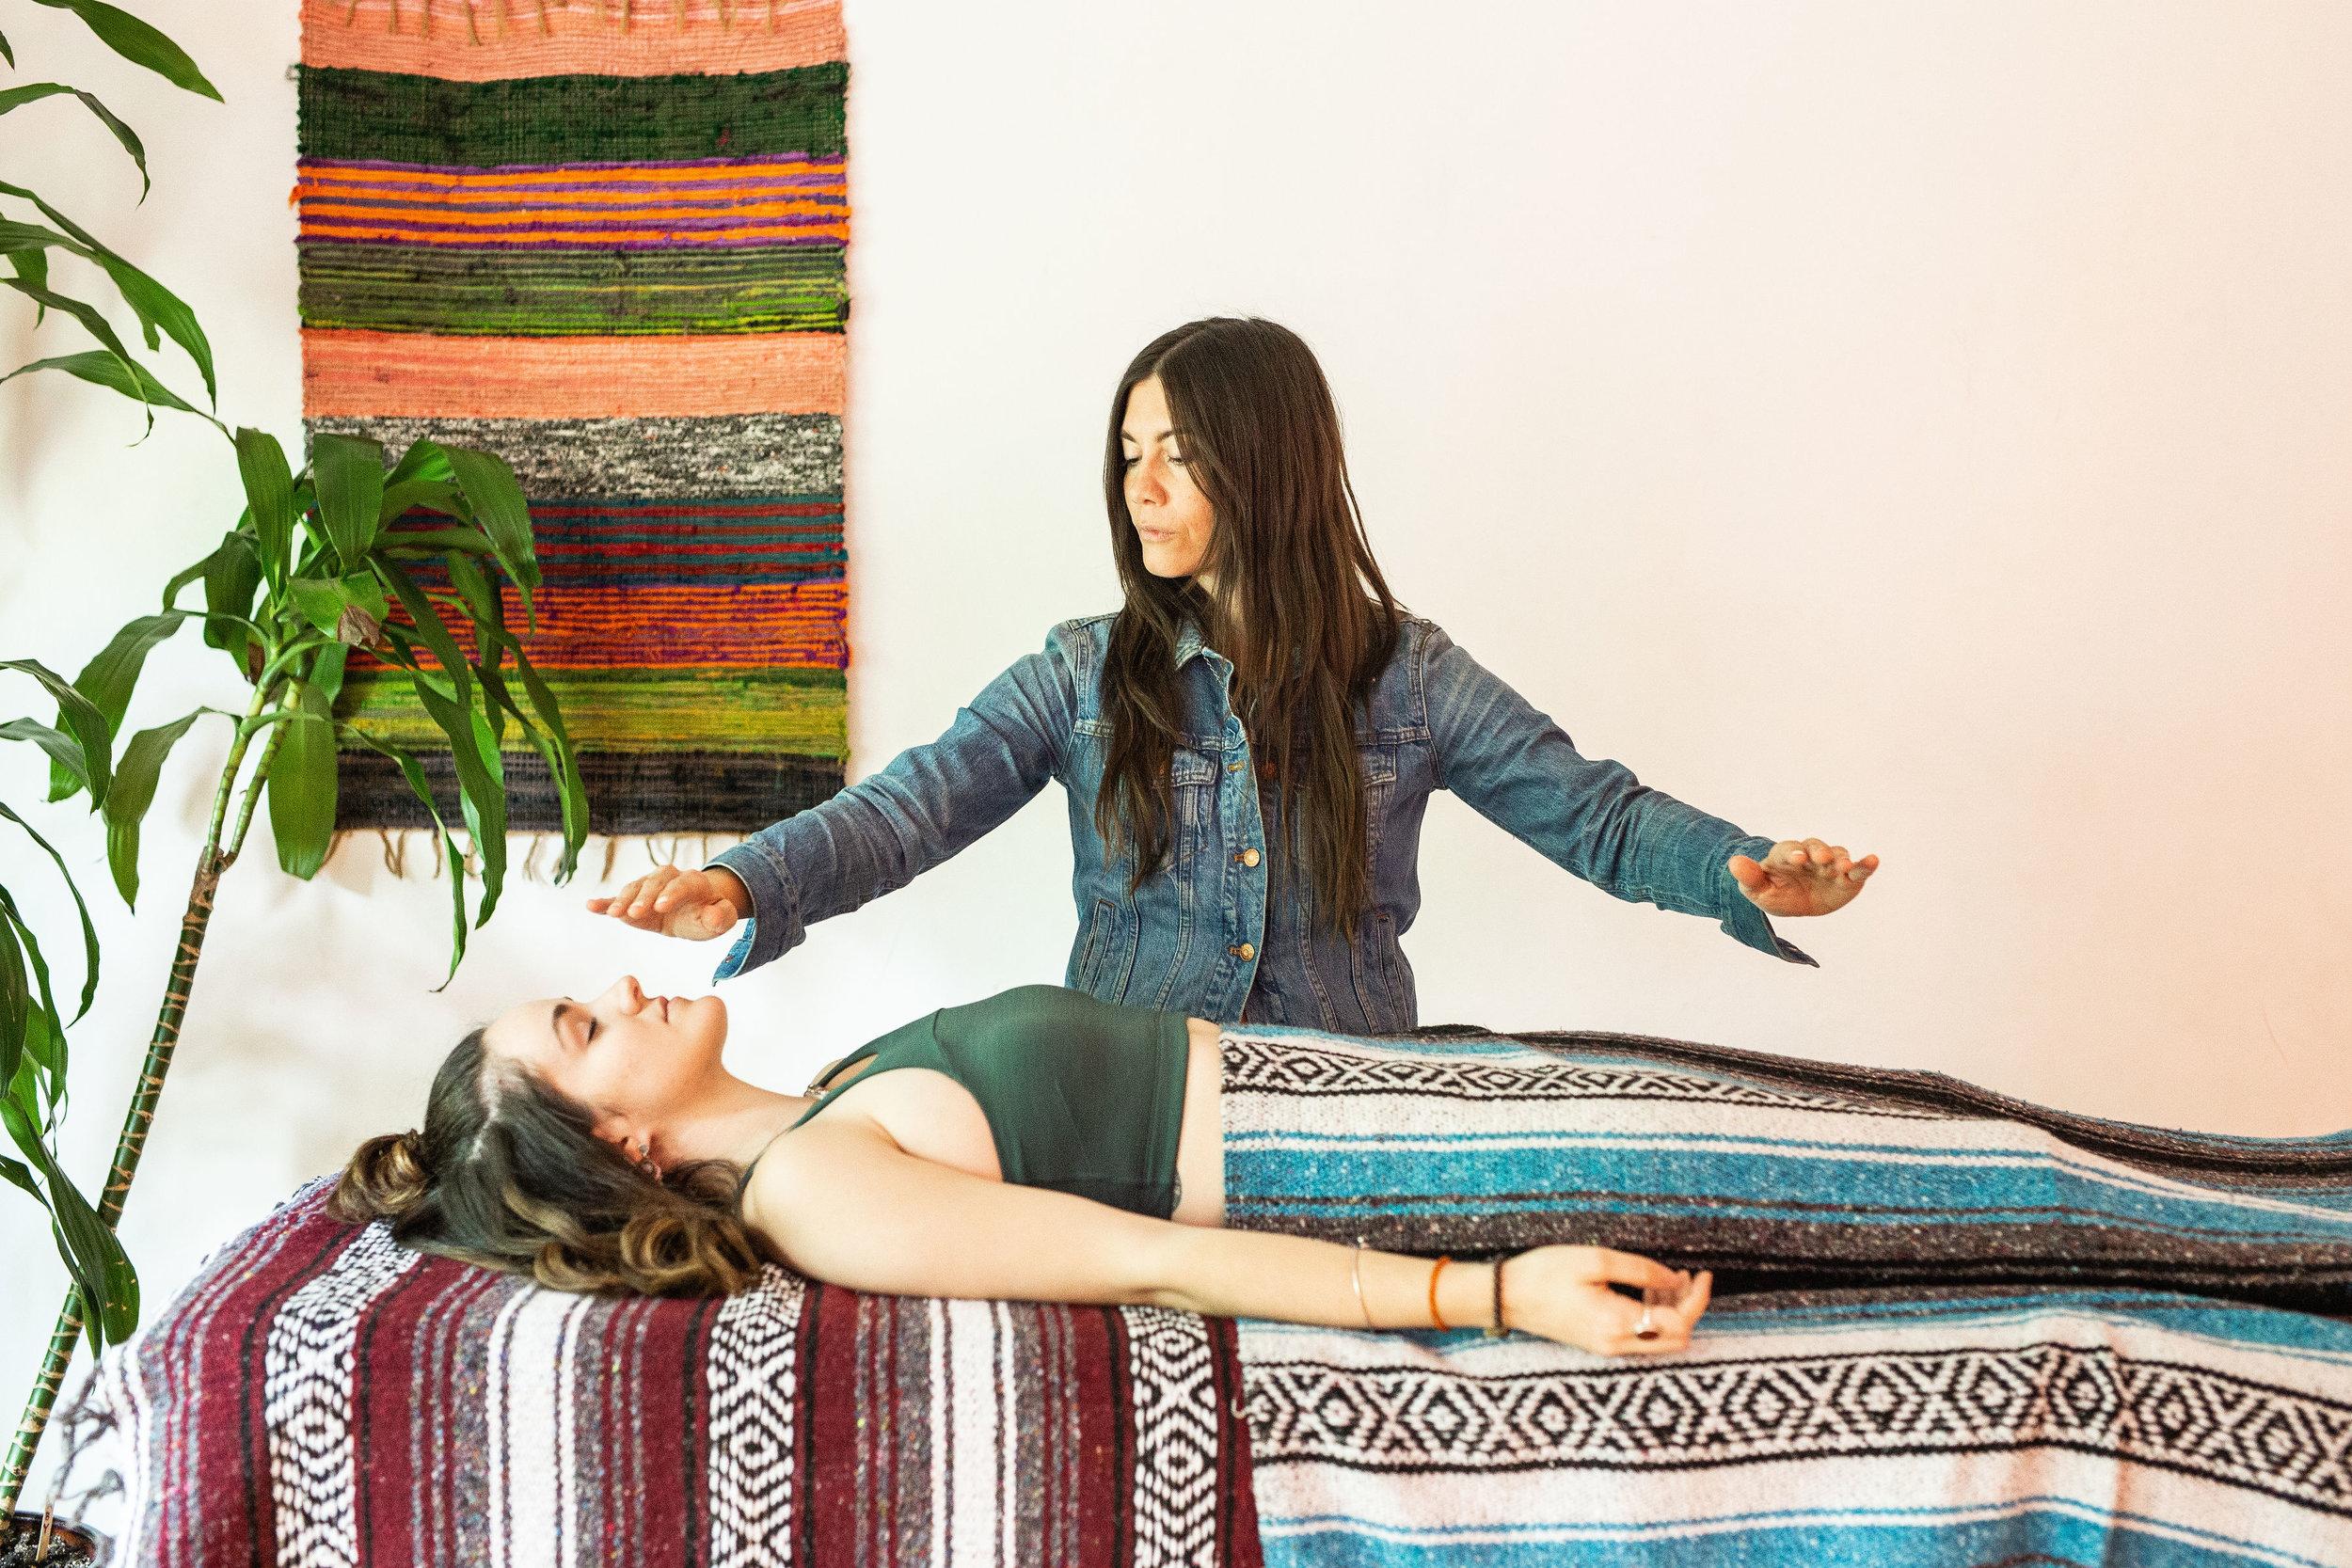 Reiki Healing @The Palace - sending you good vibes… literally.